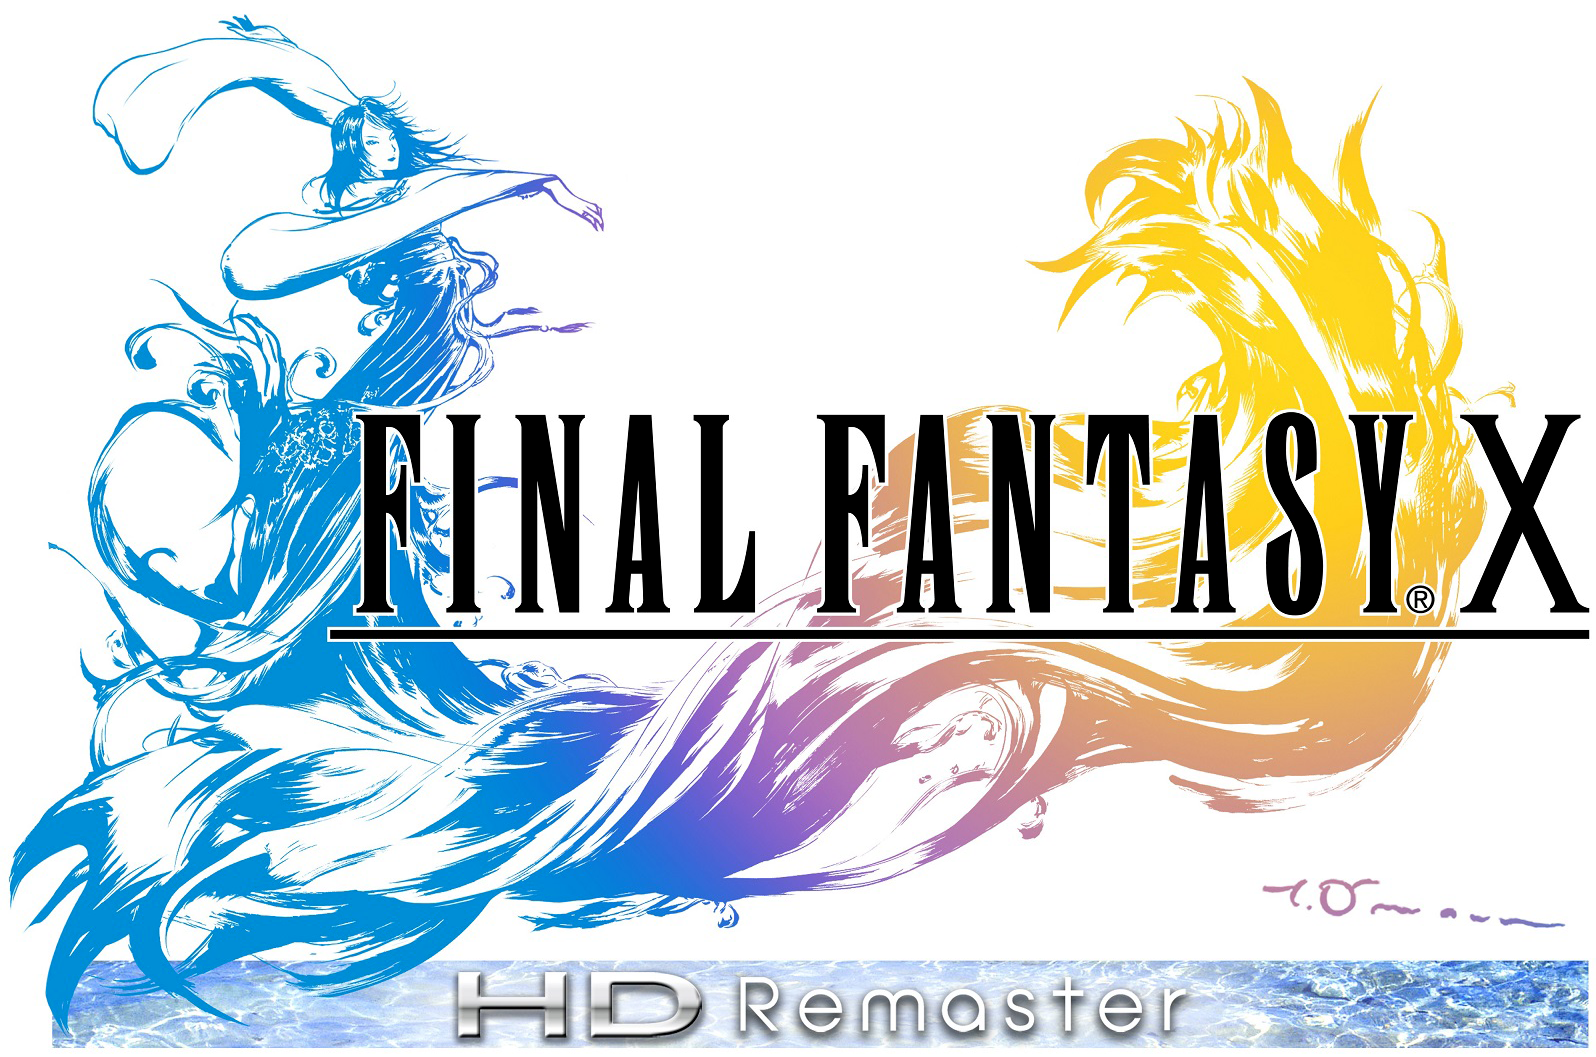 Square Enix officially announ